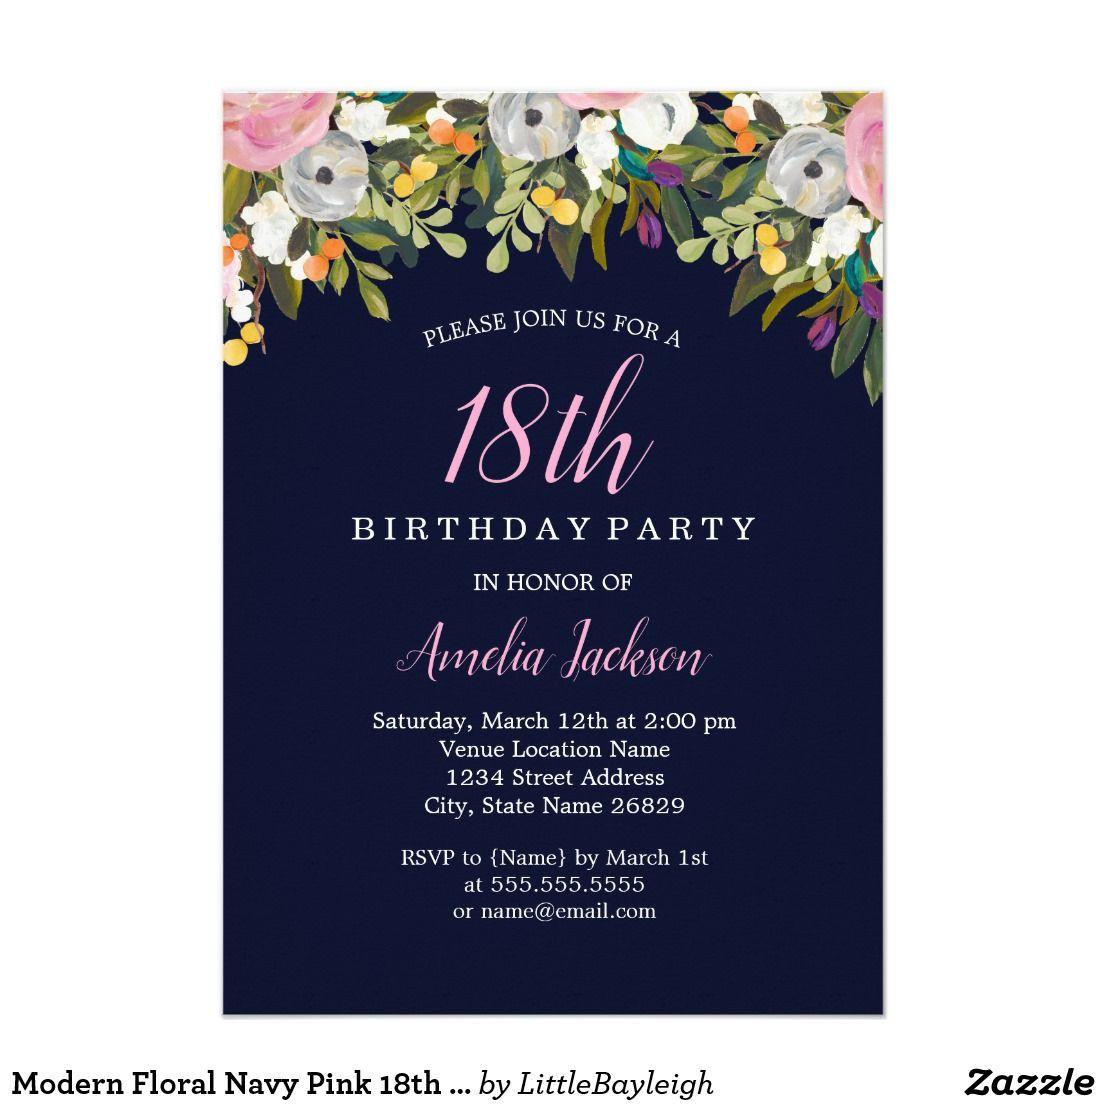 Modern Floral Navy Pink 18th Birthday Invitation